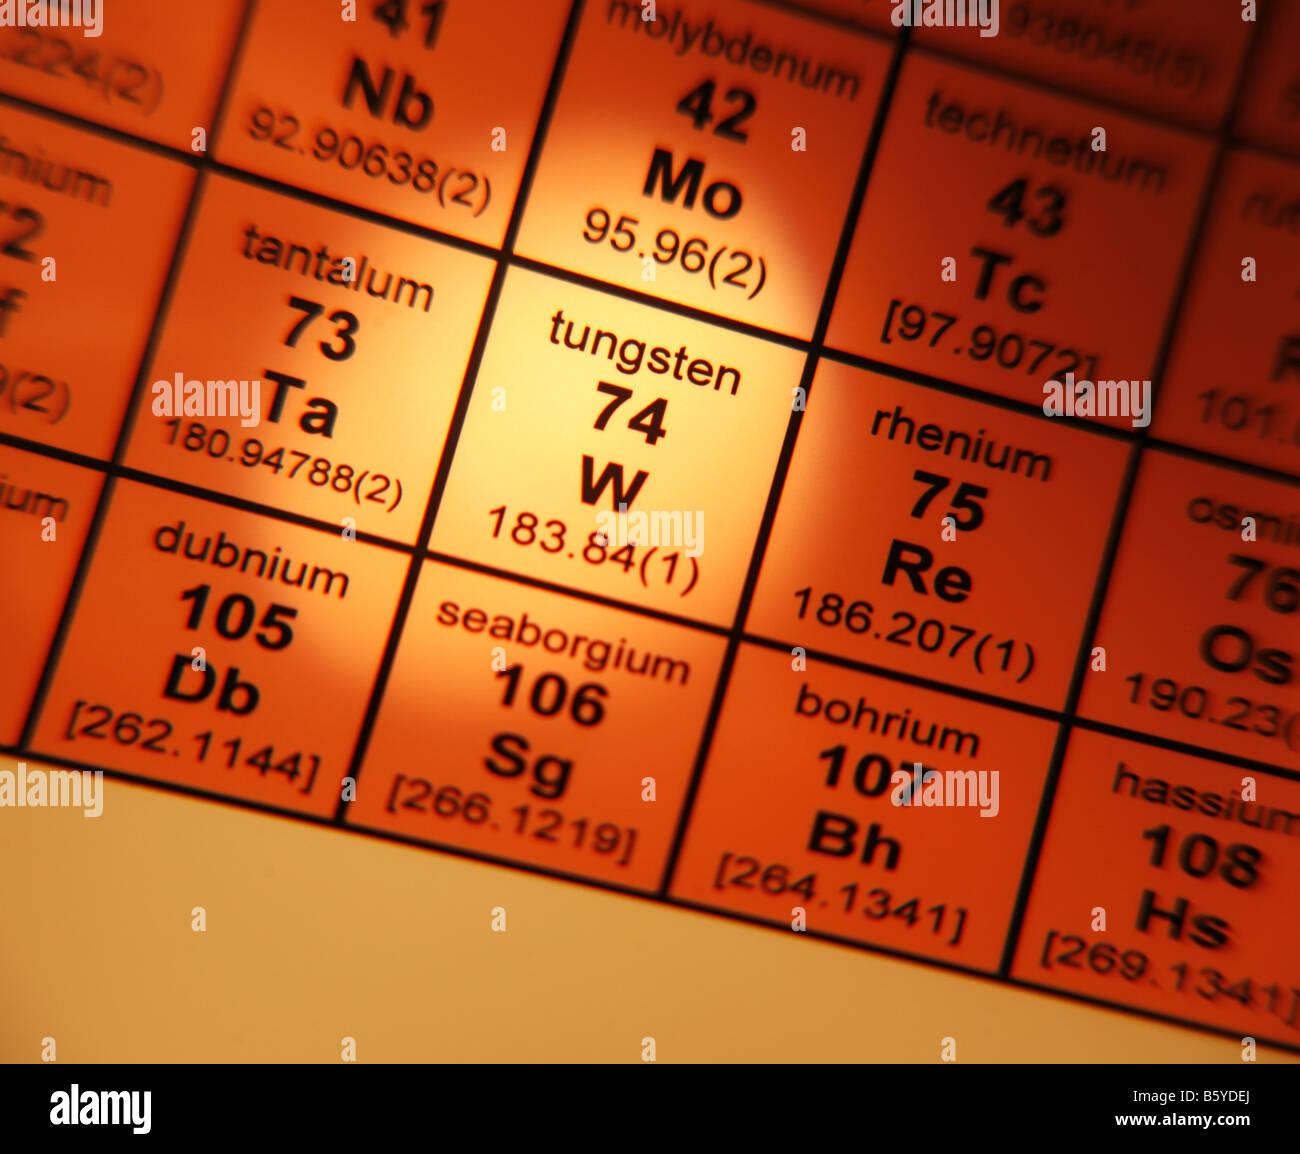 Periodic table tungsten choice image periodic table images symbol for tungsten on periodic table image collections periodic symbol for tungsten on periodic table image gamestrikefo Choice Image